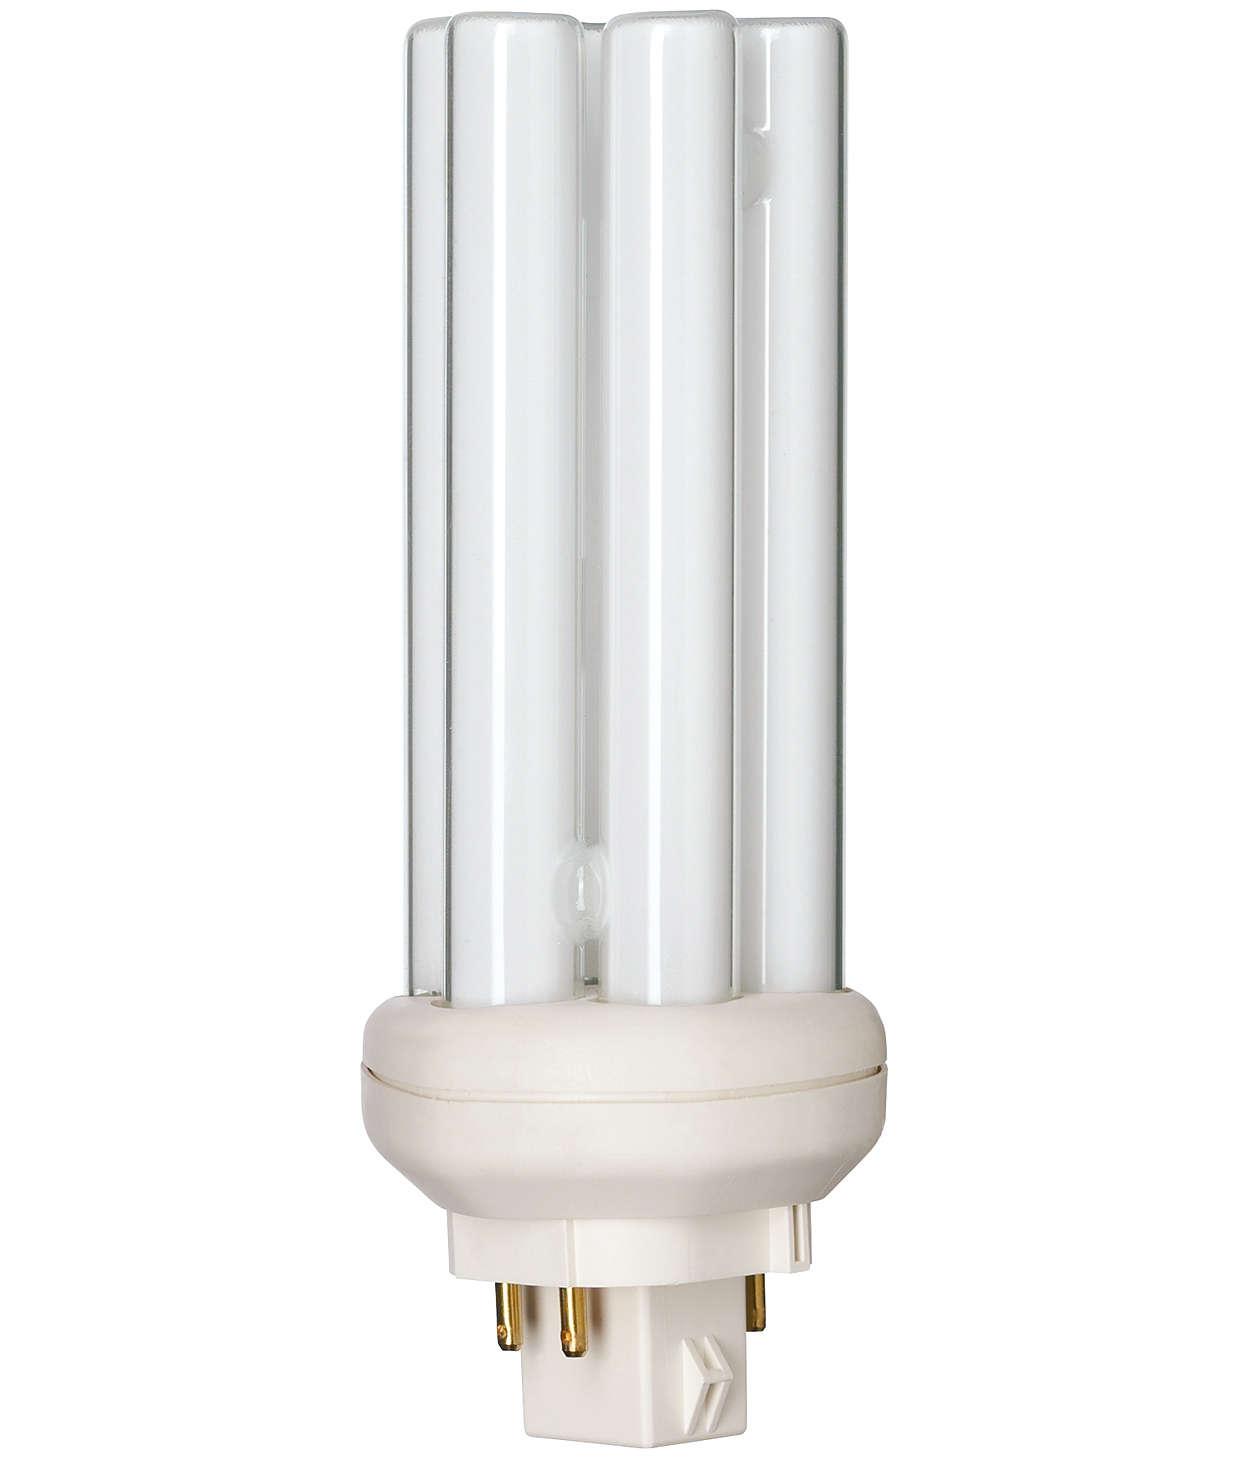 Low mercury,energy savings